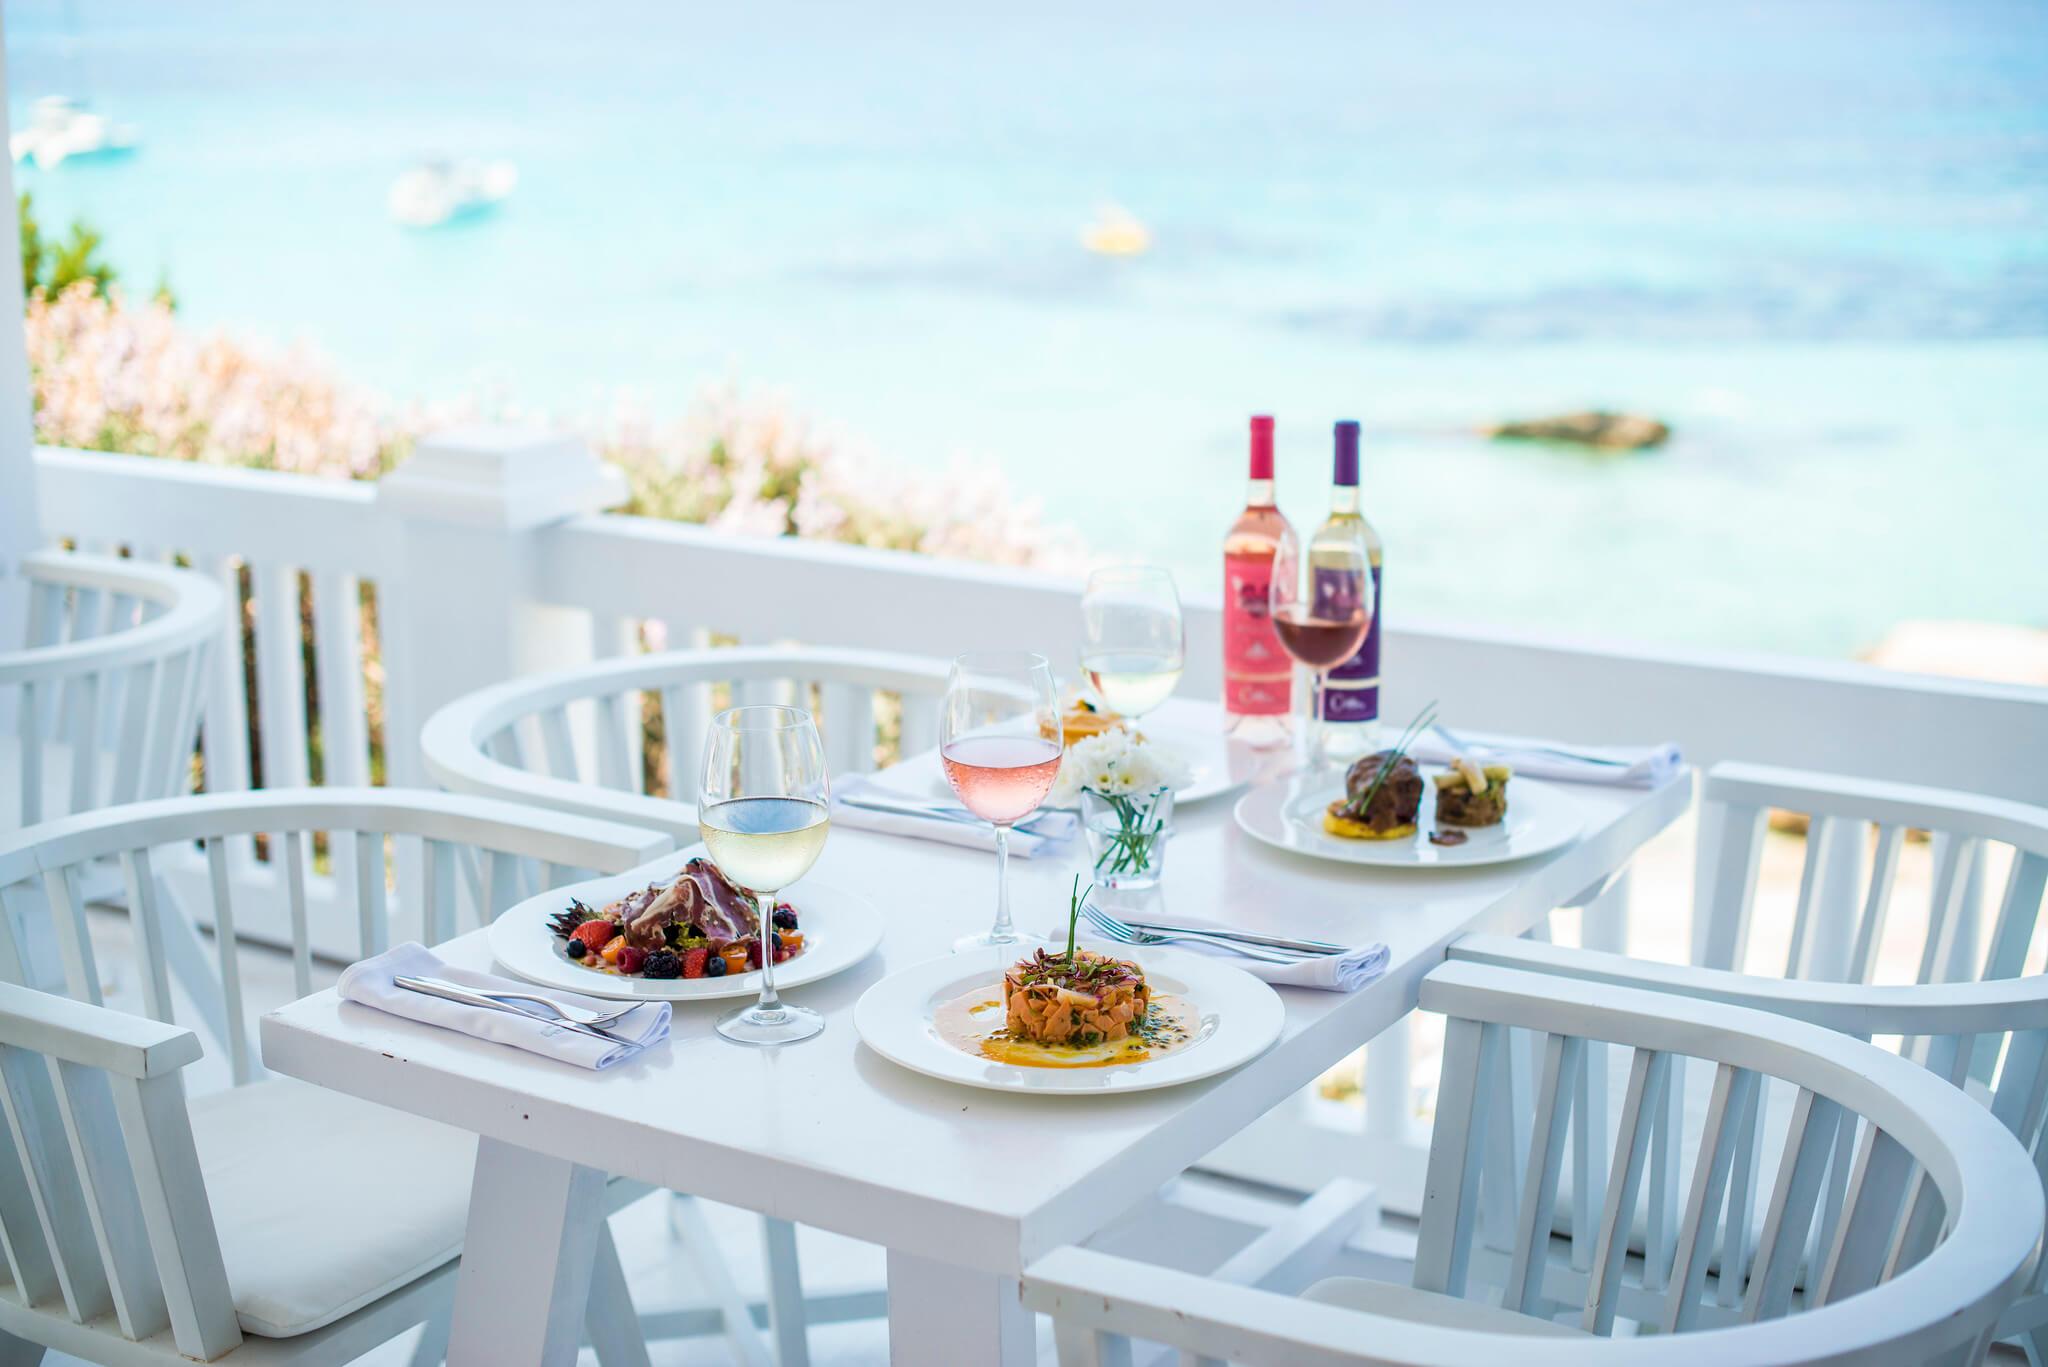 https://www.white-ibiza.com/wp-content/uploads/2020/03/ibiza-beach-restaurant-cotton-beach-club-2020-01.jpg